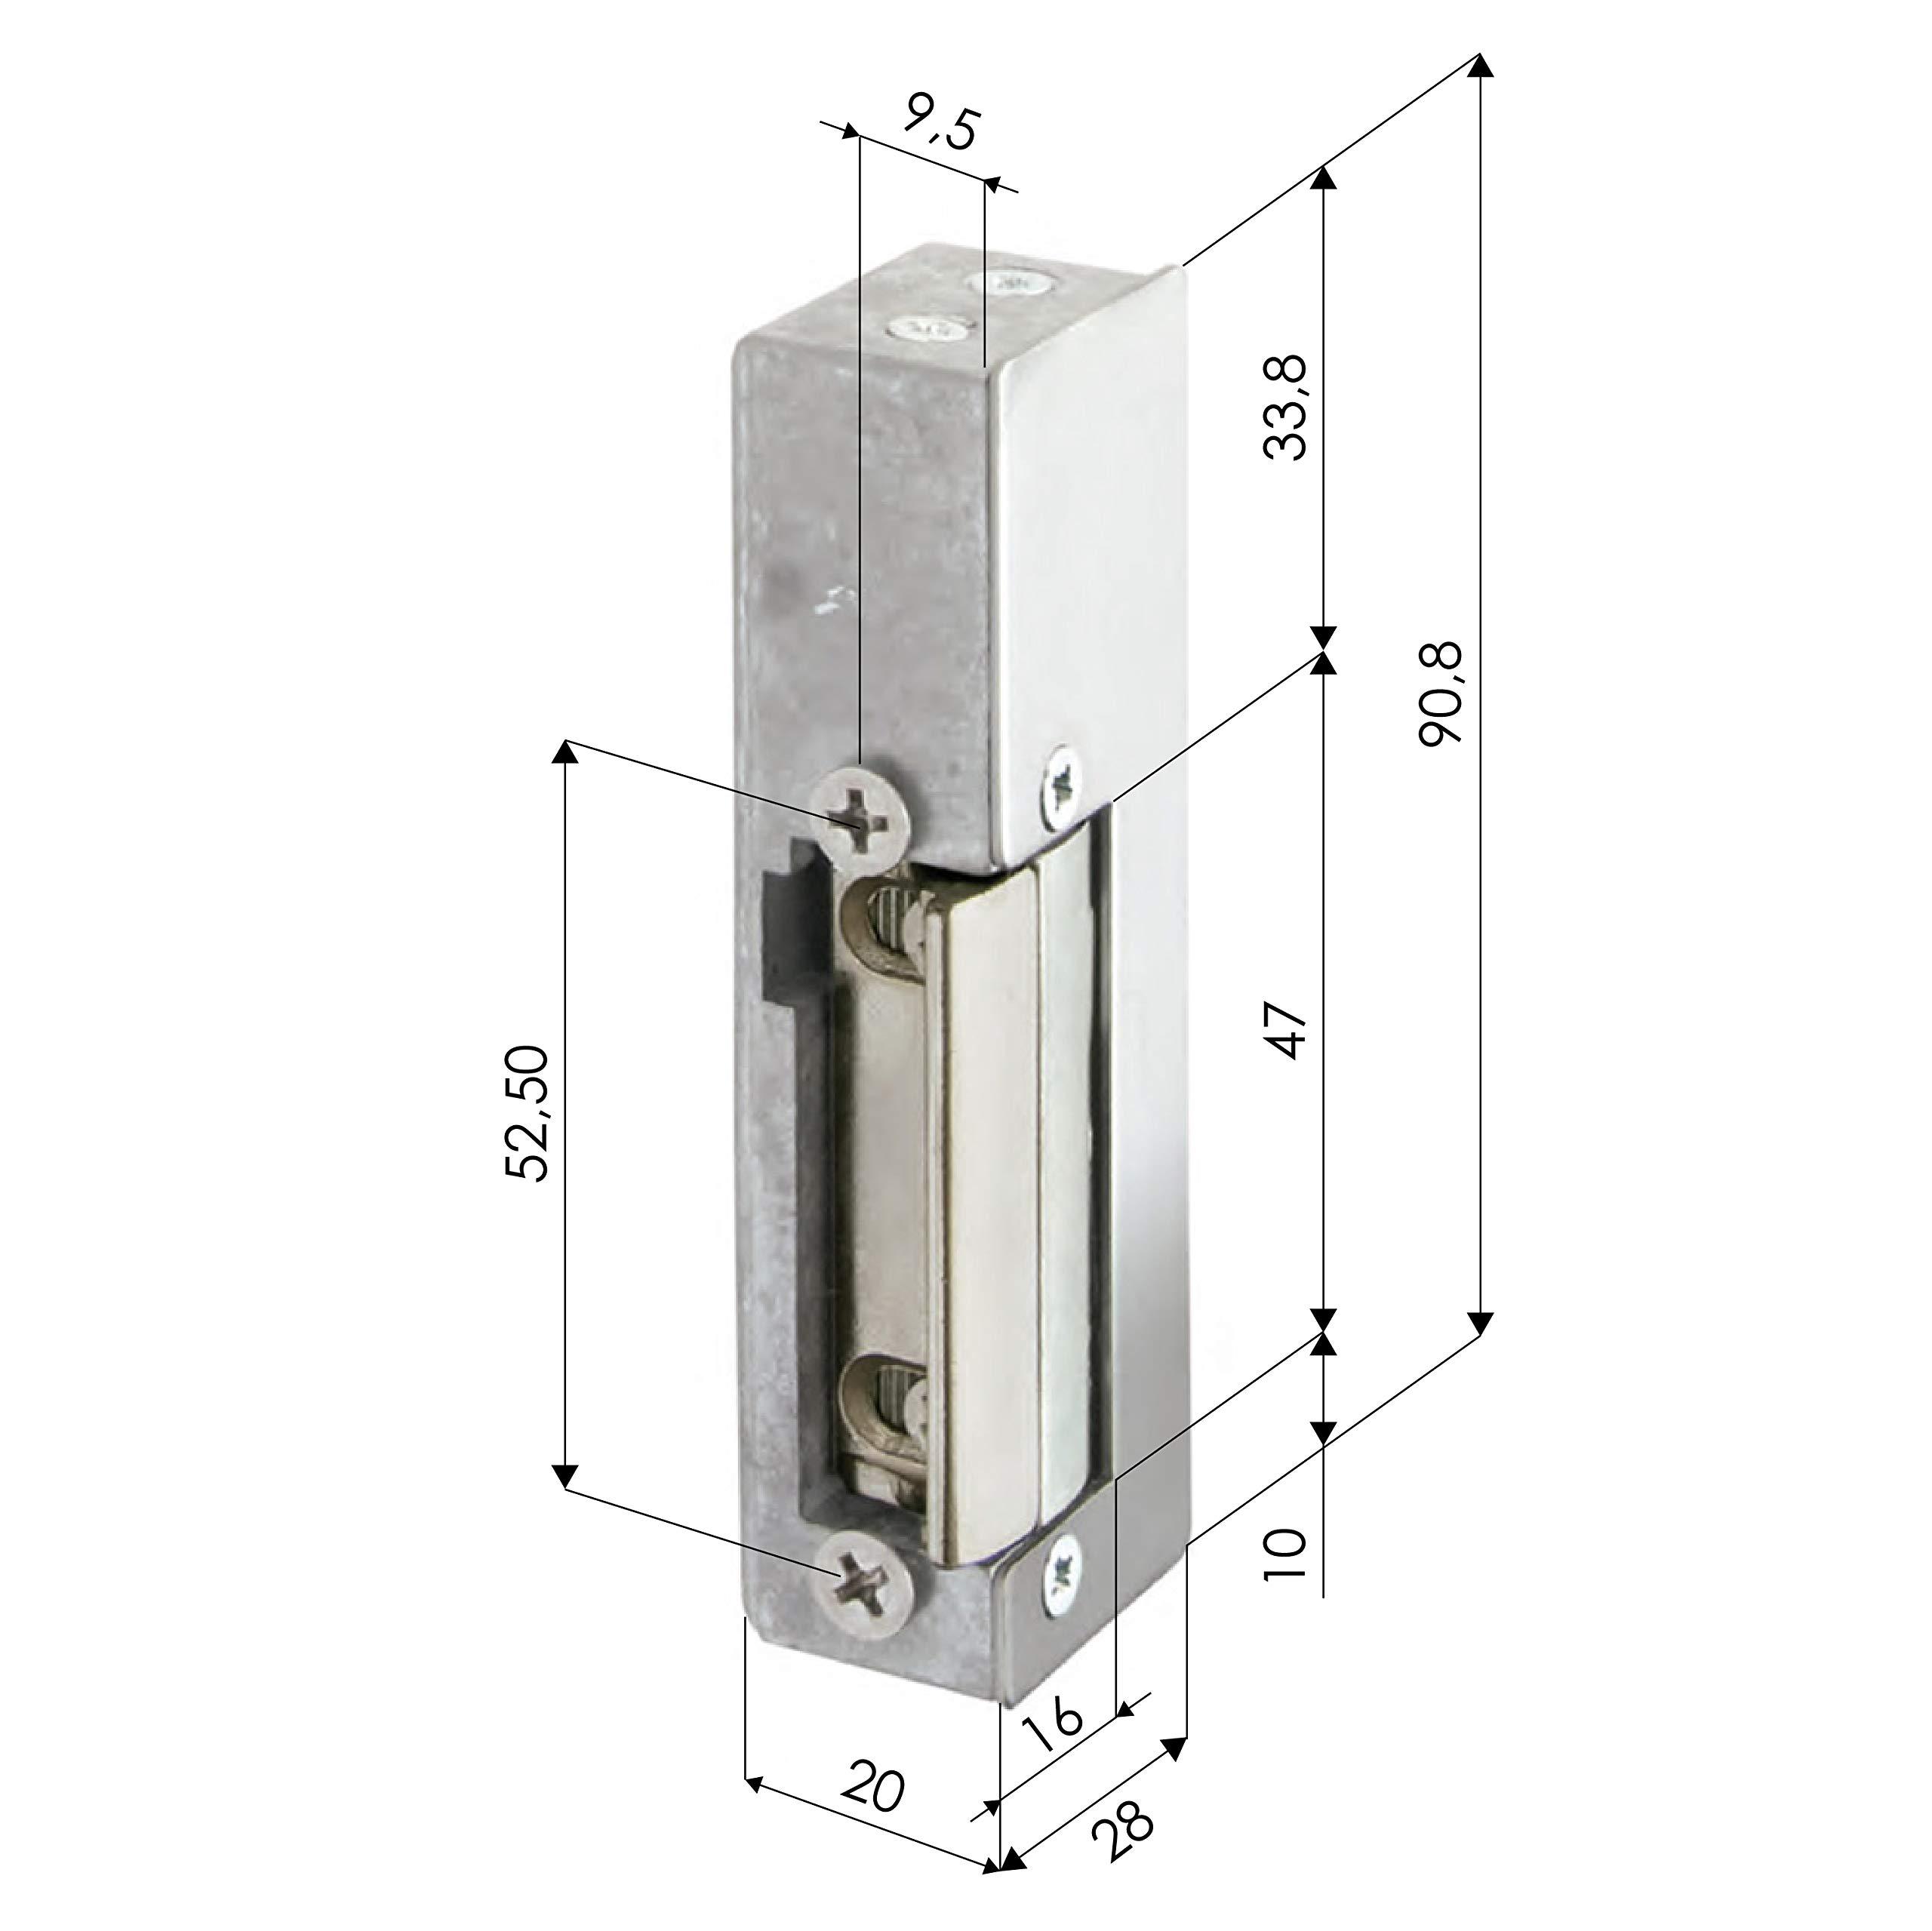 Cerradura eléctrica - V AC - ZKTeco 3002 - Abrepuertas ajustable ...